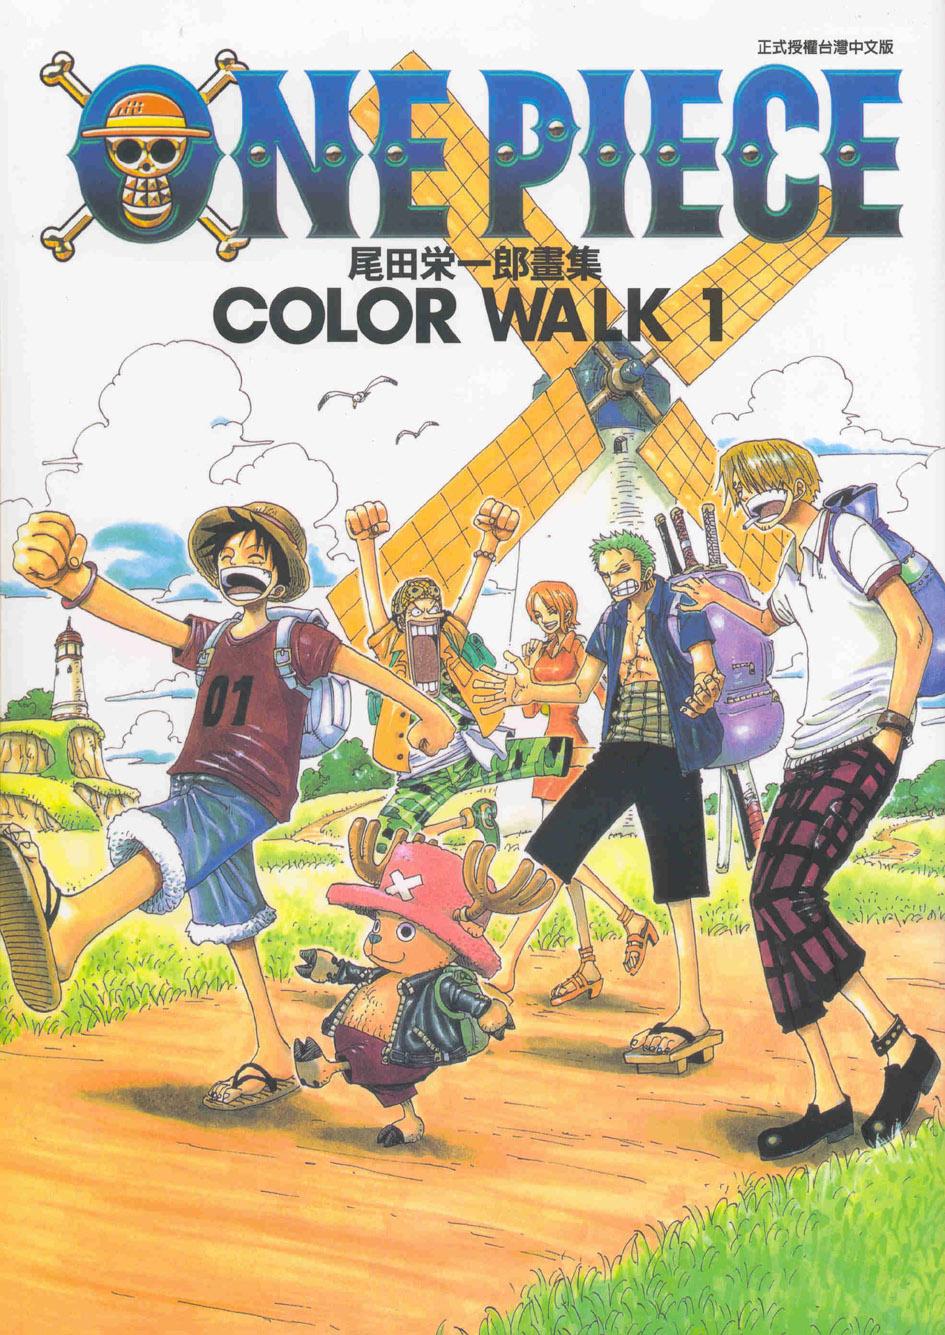 尾田栄一郎畫集 ONE PIECE COLOR WALK 1